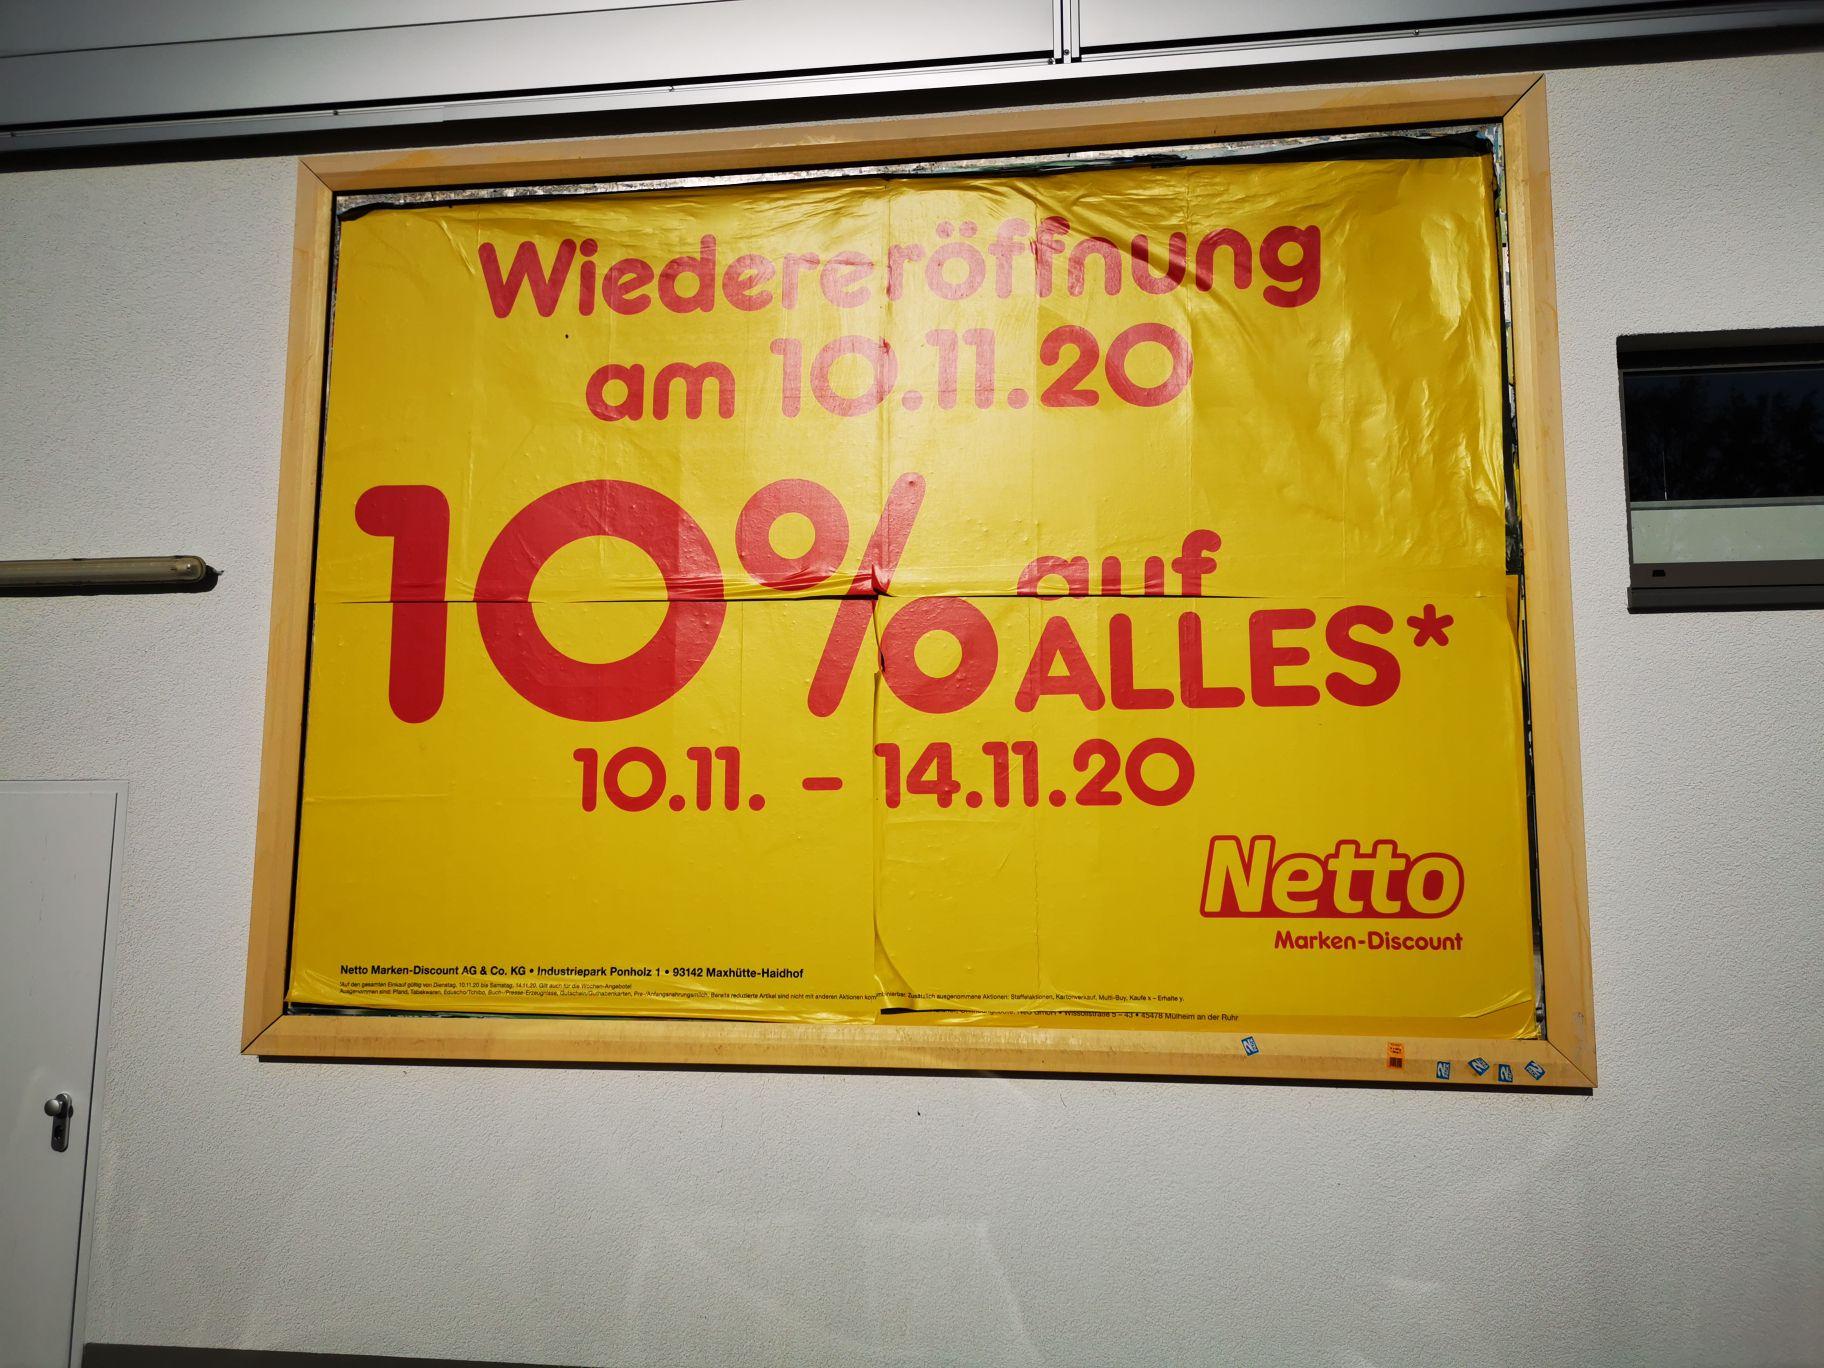 10% bei Netto Sankt Augustin Birlinghoven 10-14.11.2020